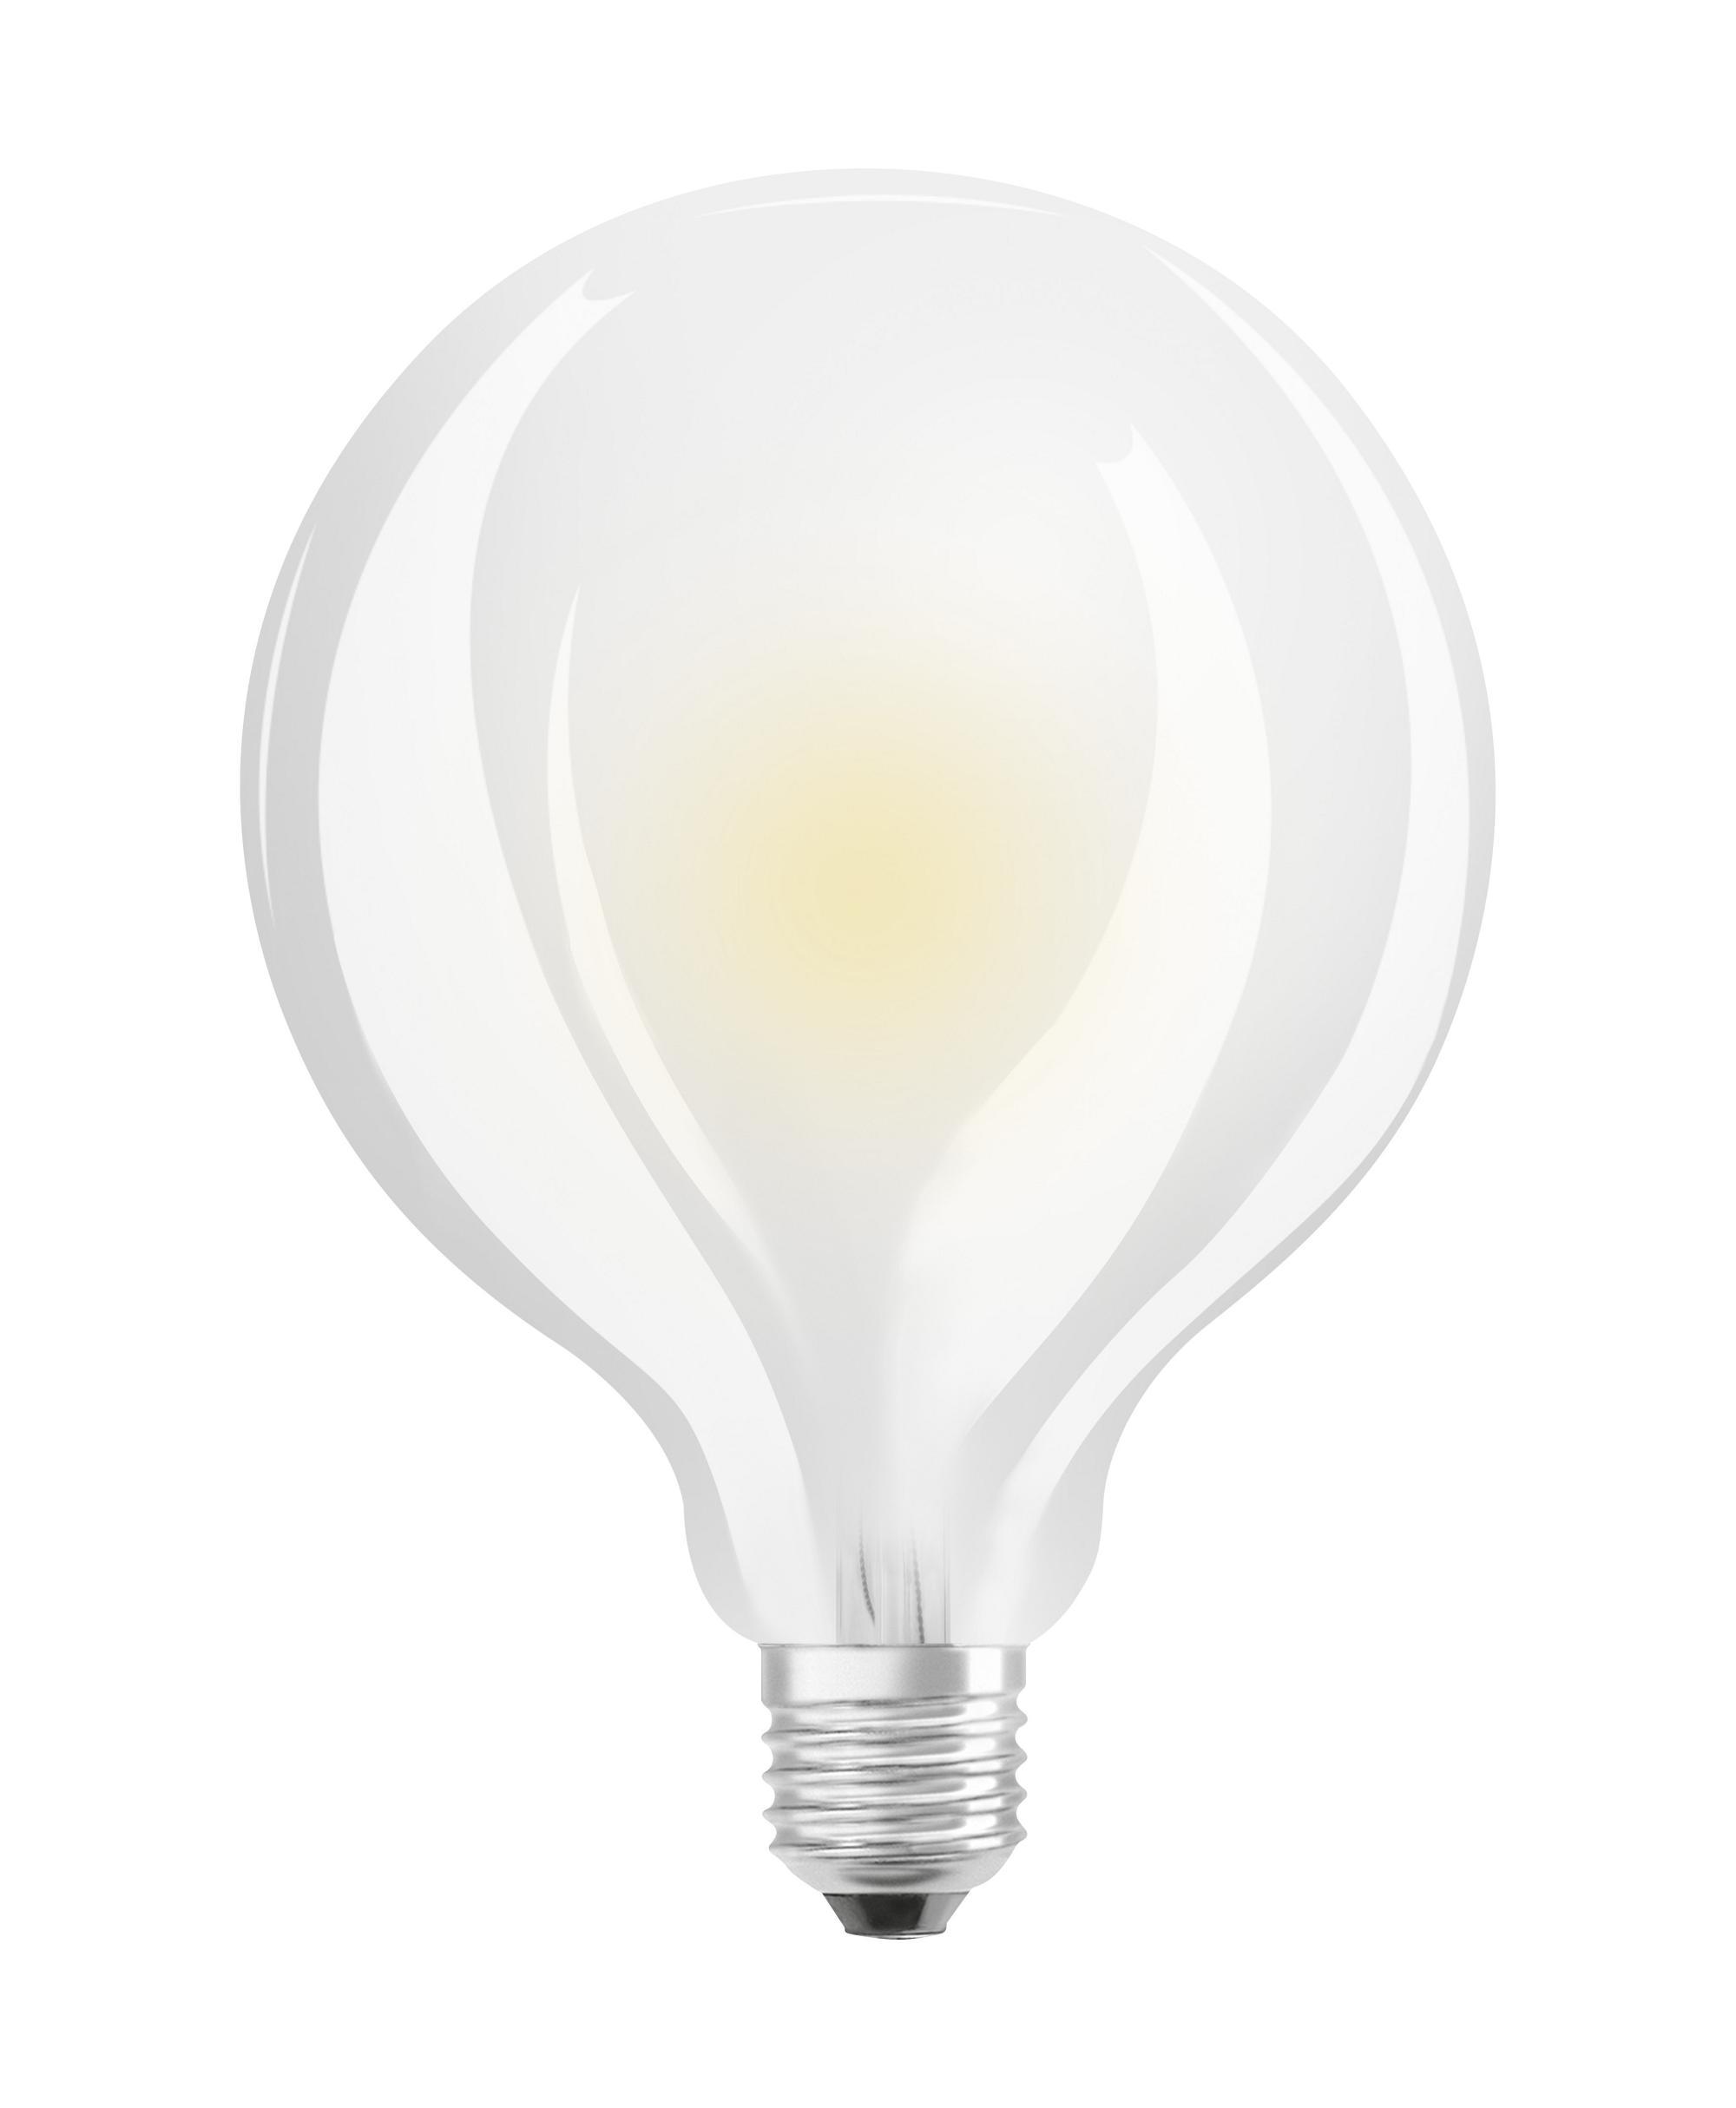 Osram Globelampe matt / 7W warmweiß von UNI-Elektro